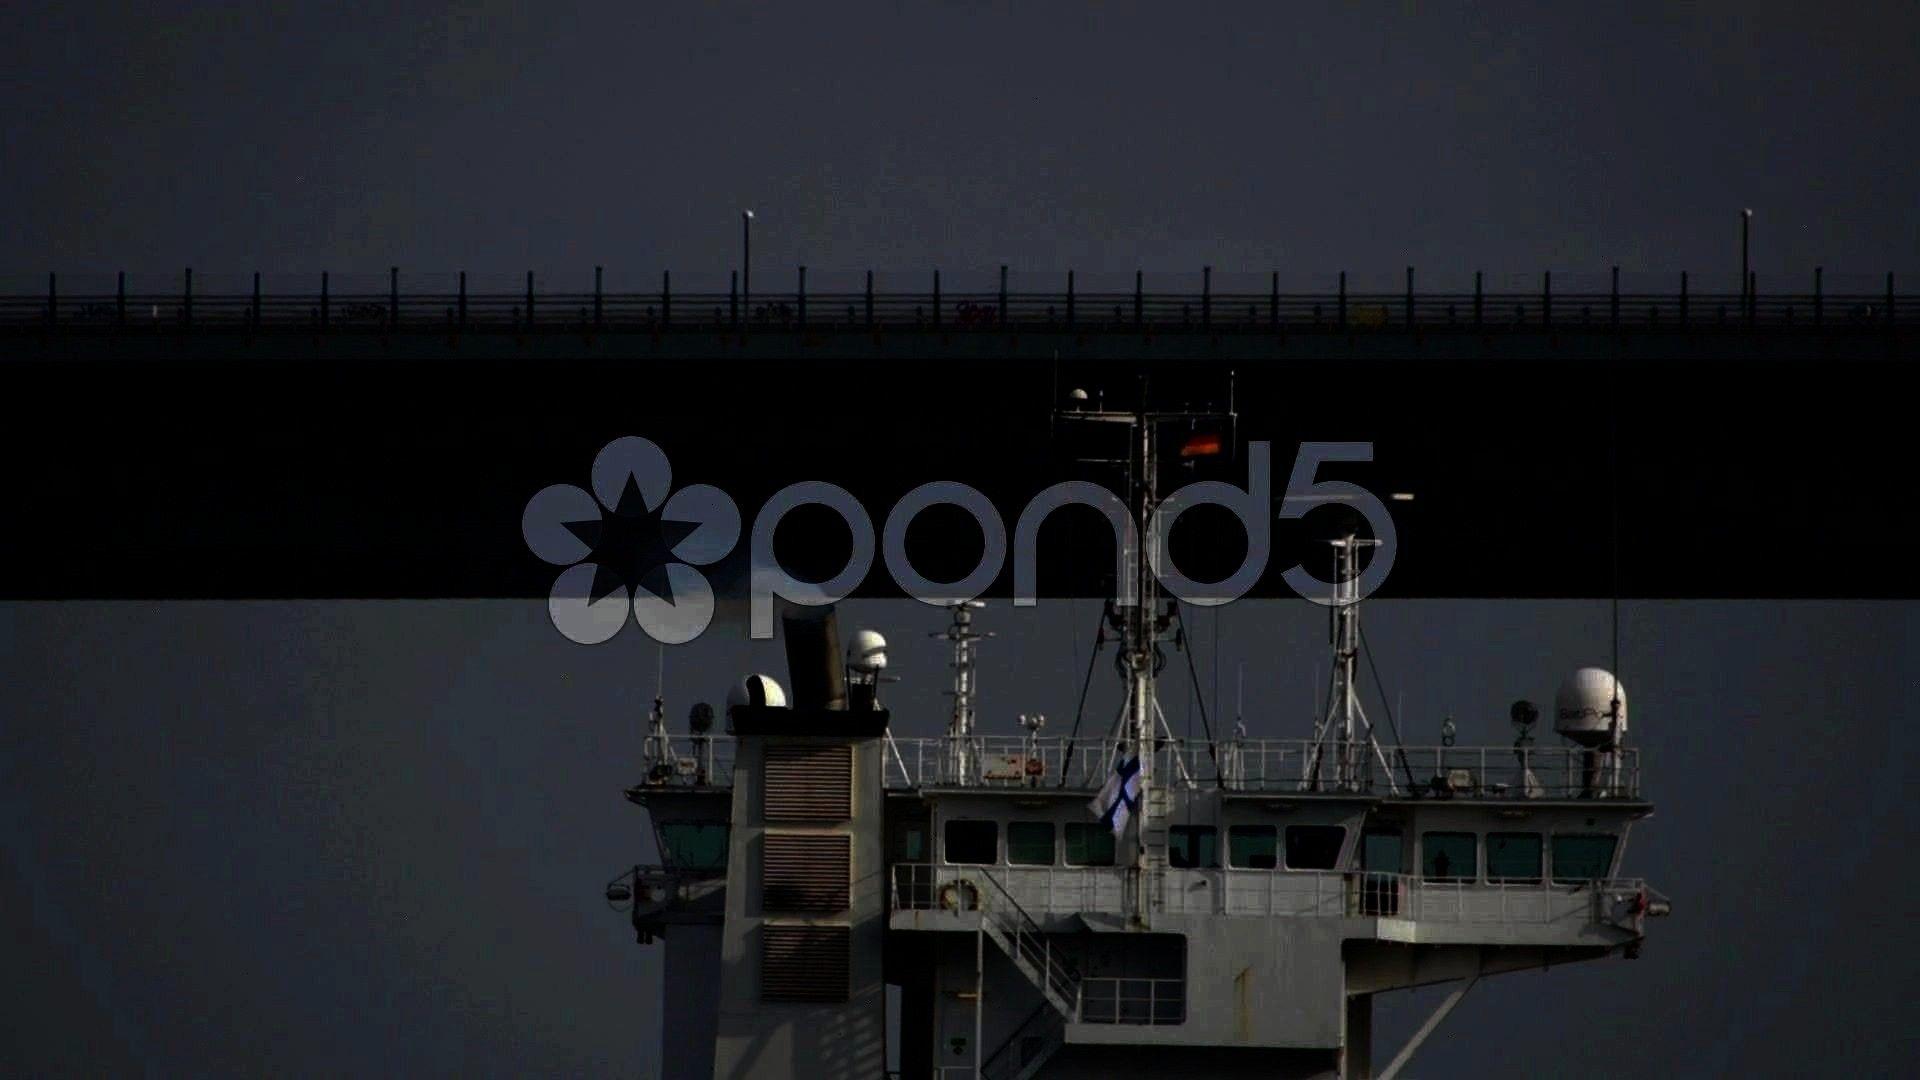 #shipcargosmokekielsmoke #shipcargosmokekiel #ideascastock #kartencanal #cargocargo #stockship #smok...